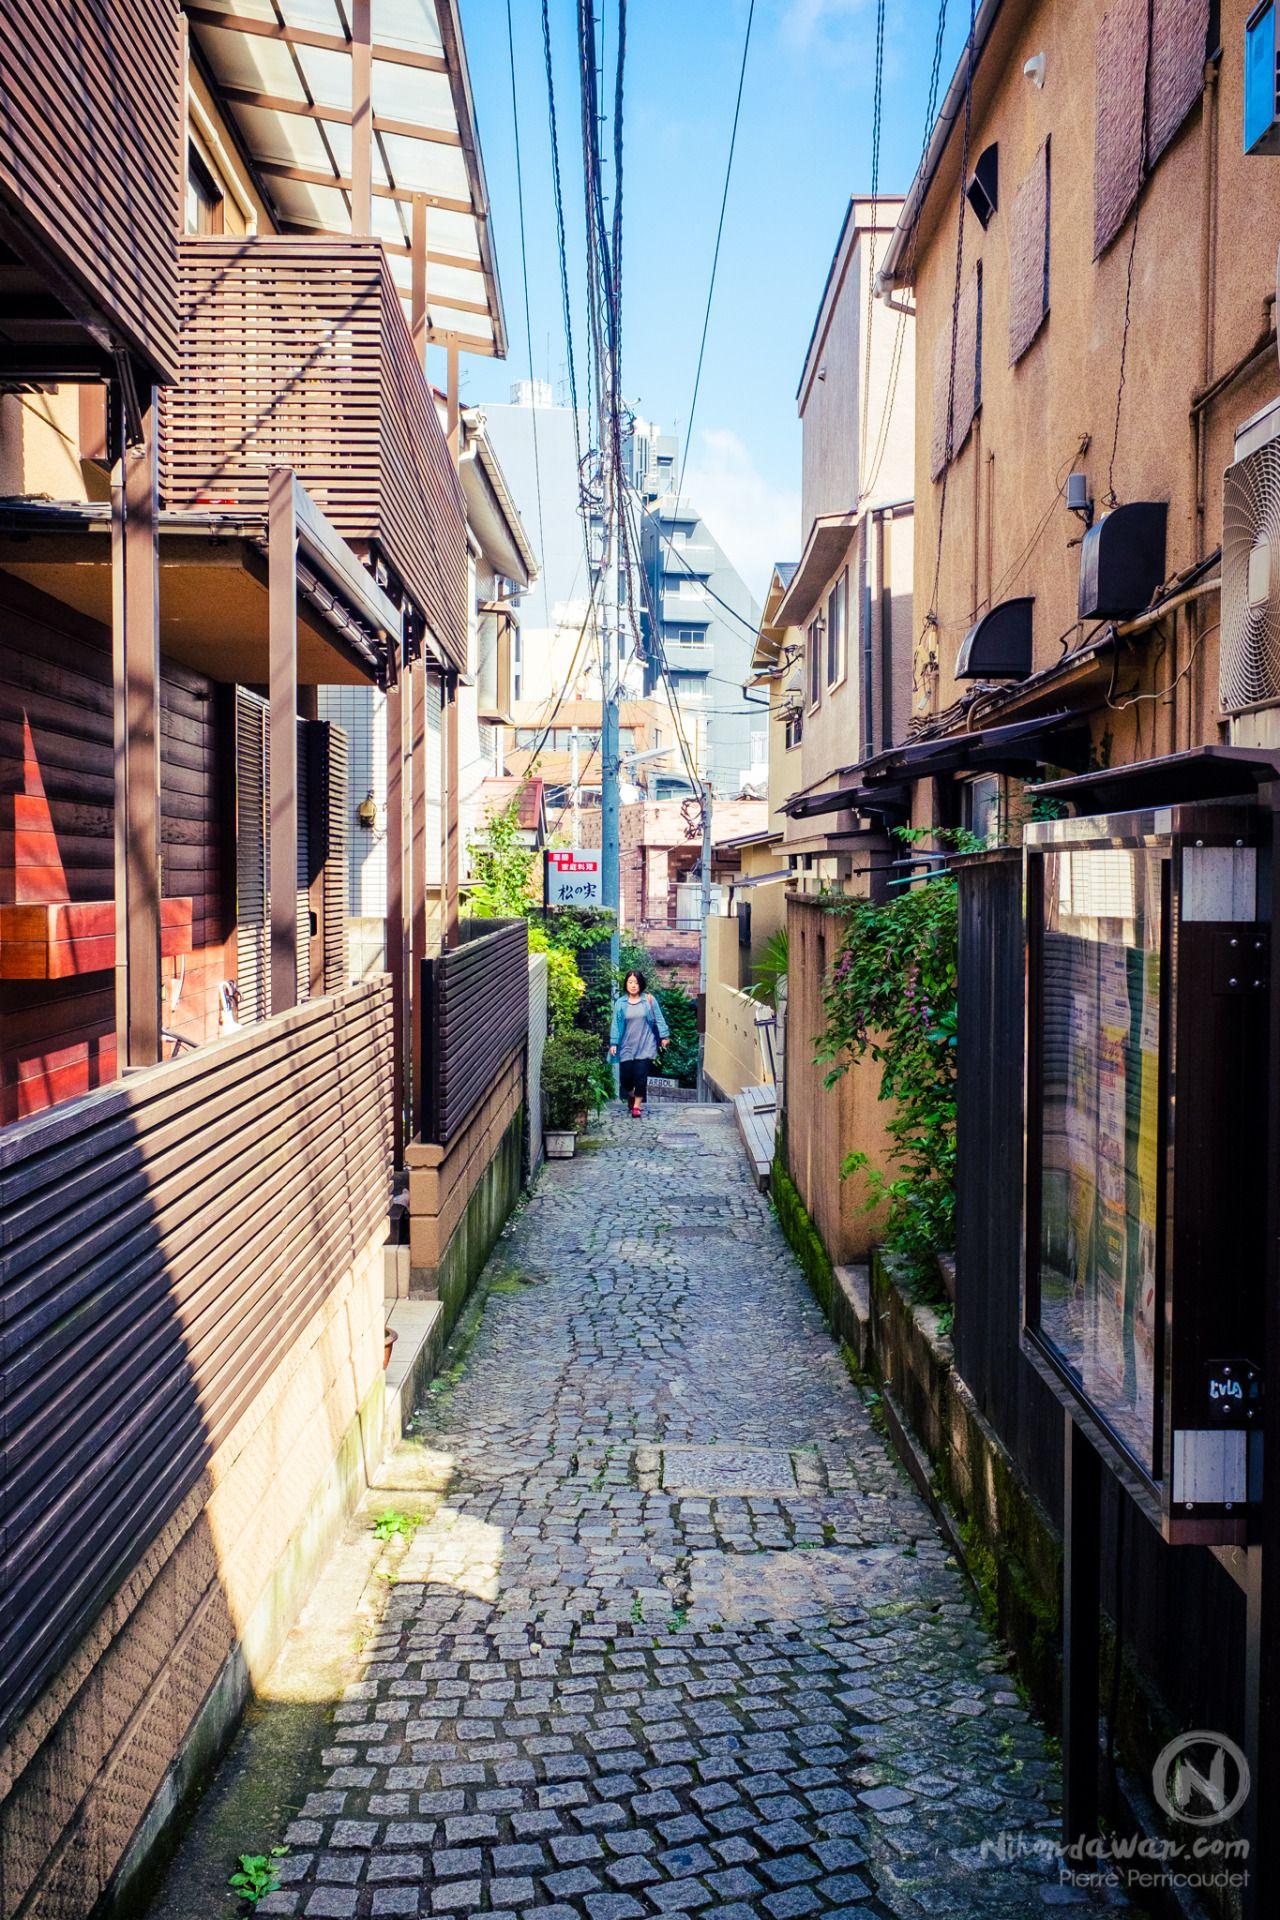 Japan Tokyo Kagurazaka Street photography | Tokyo | Japan ...  Japan Tokyo Kag...